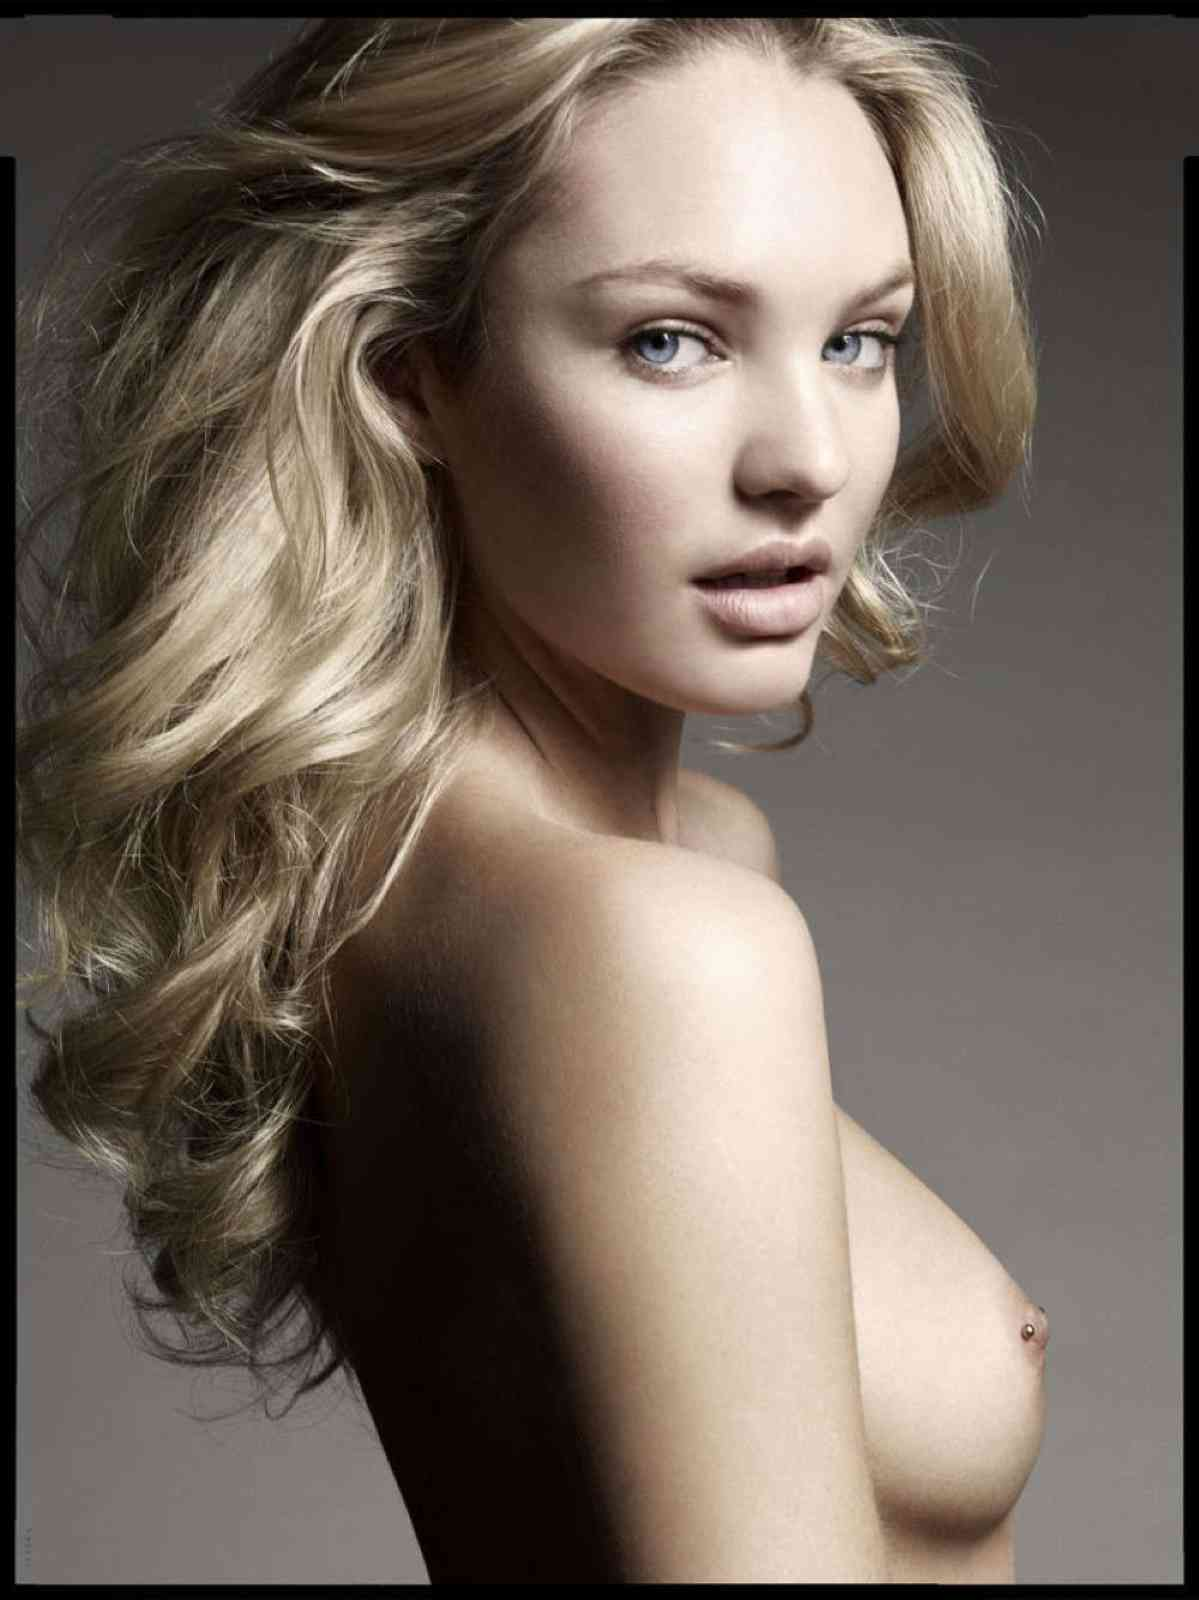 Candice Swanepoel - breasts